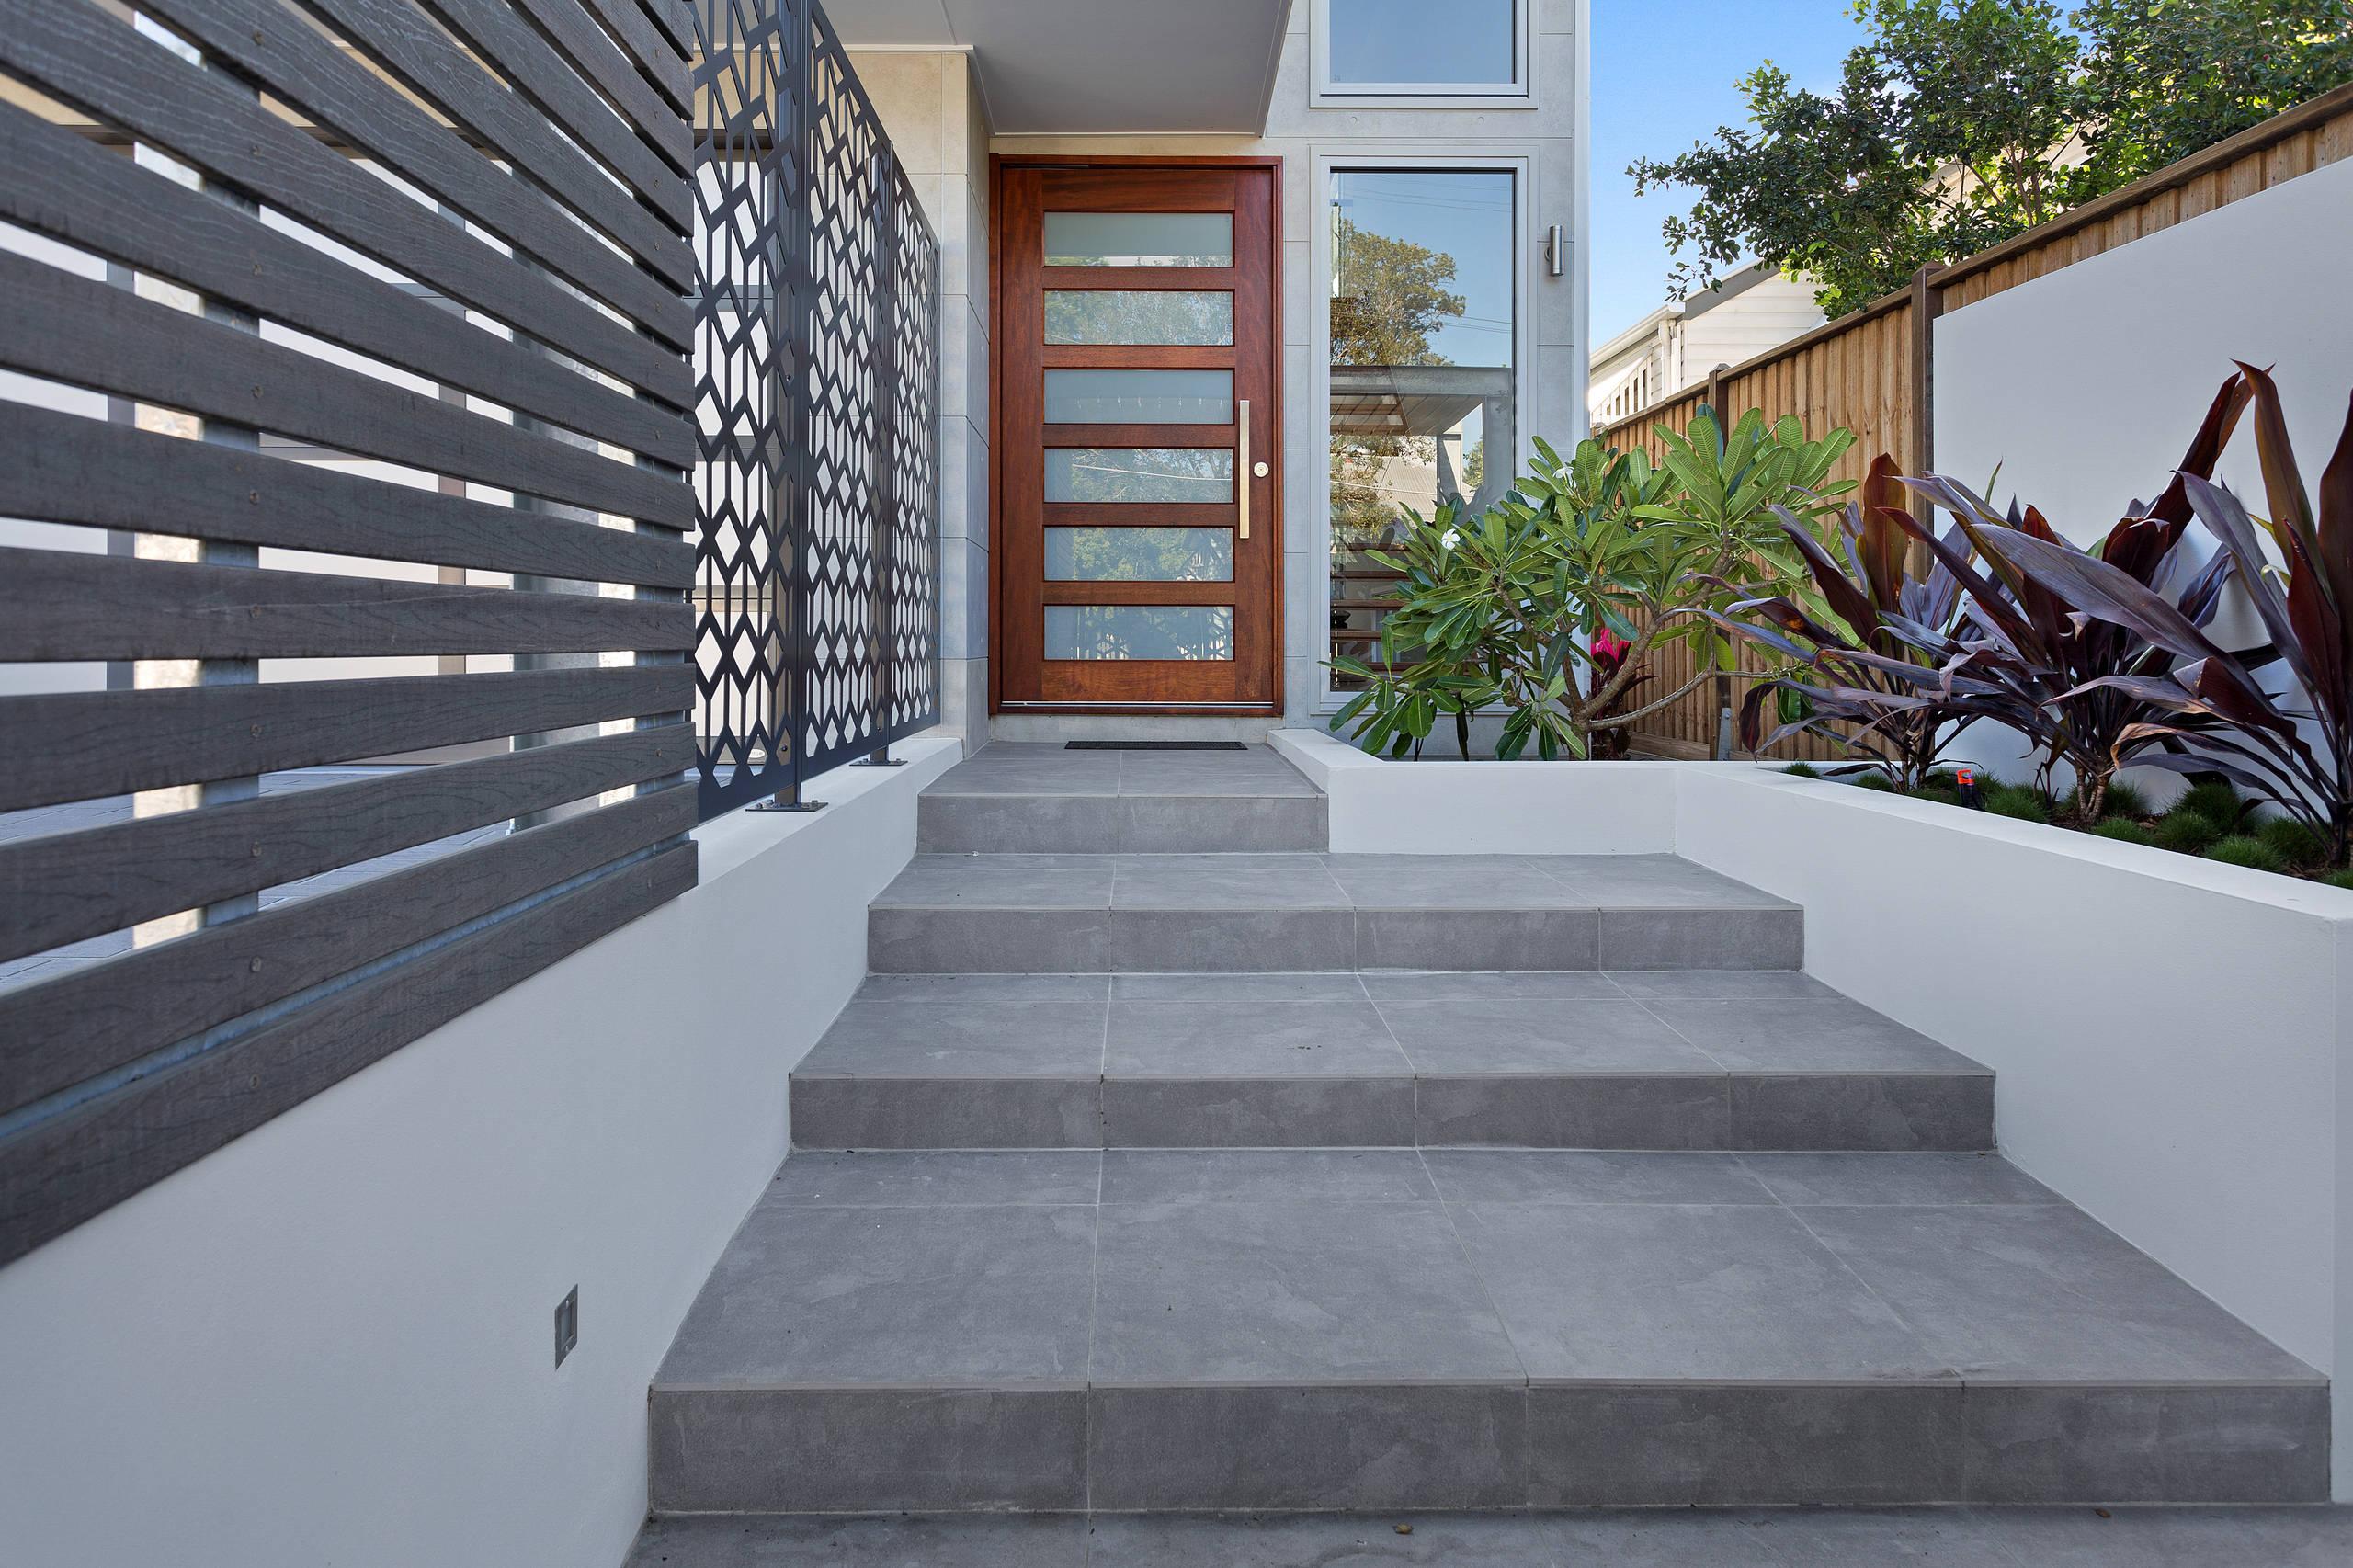 outside tile flooring ideas for patio